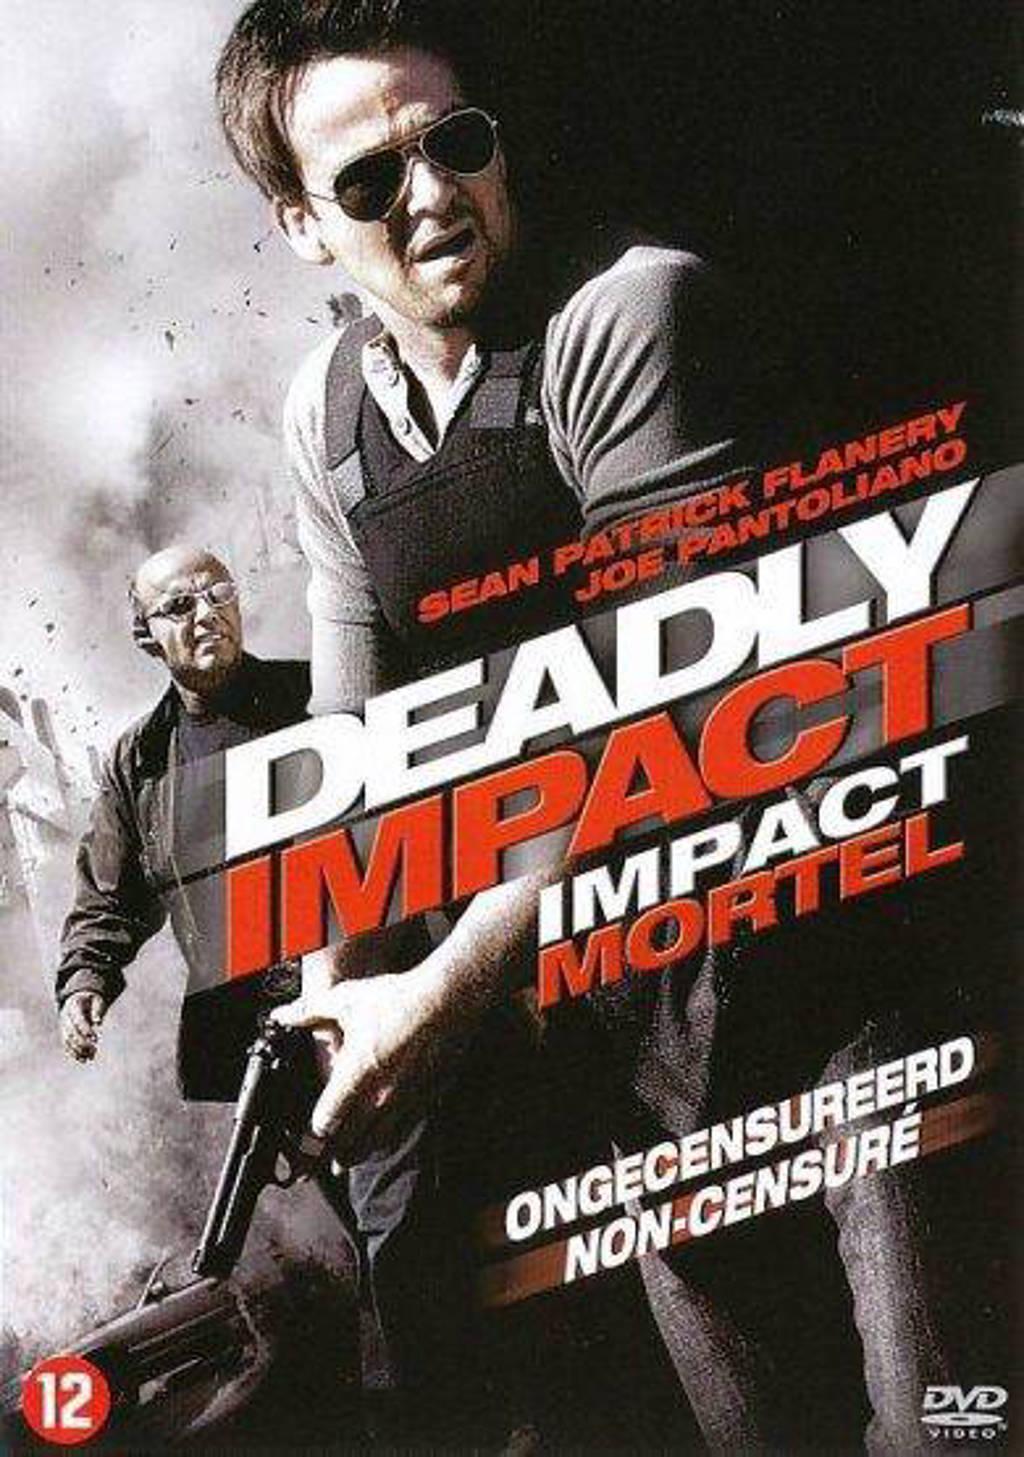 Deadly impact (DVD)